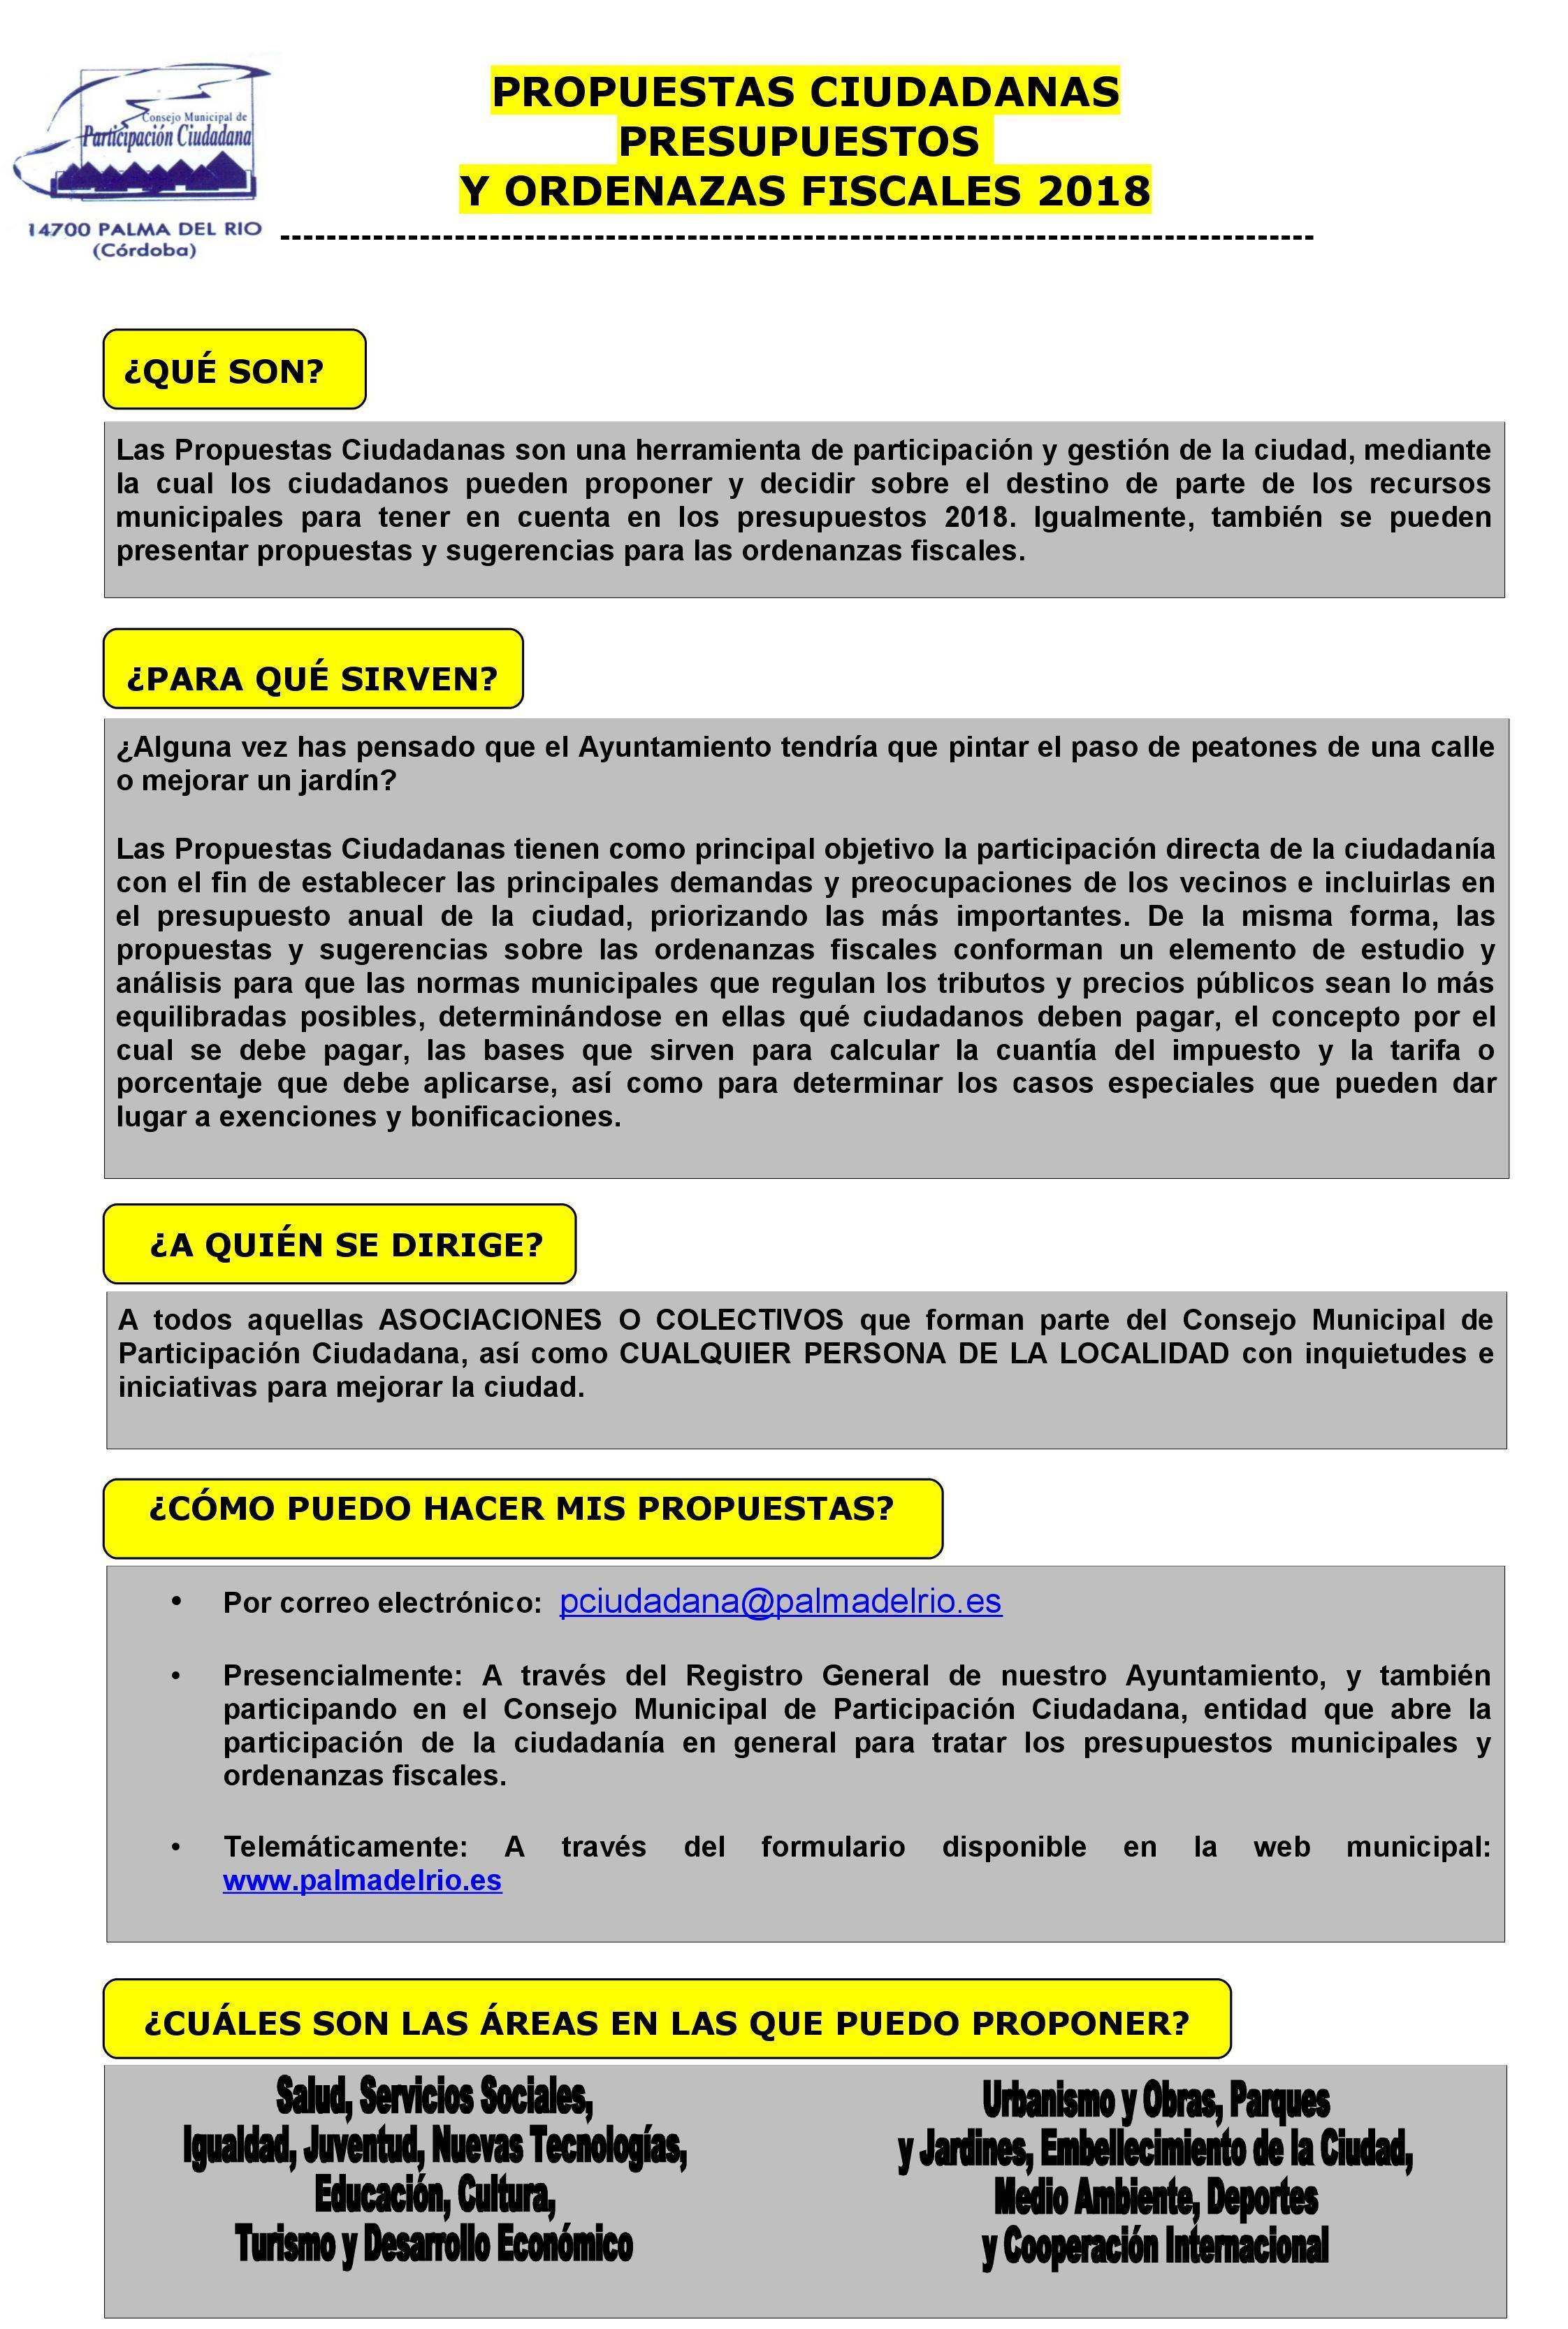 https://www.palmadelrio.es/sites/default/files/herramienta_propuesta_presupuestos_2018.jpg